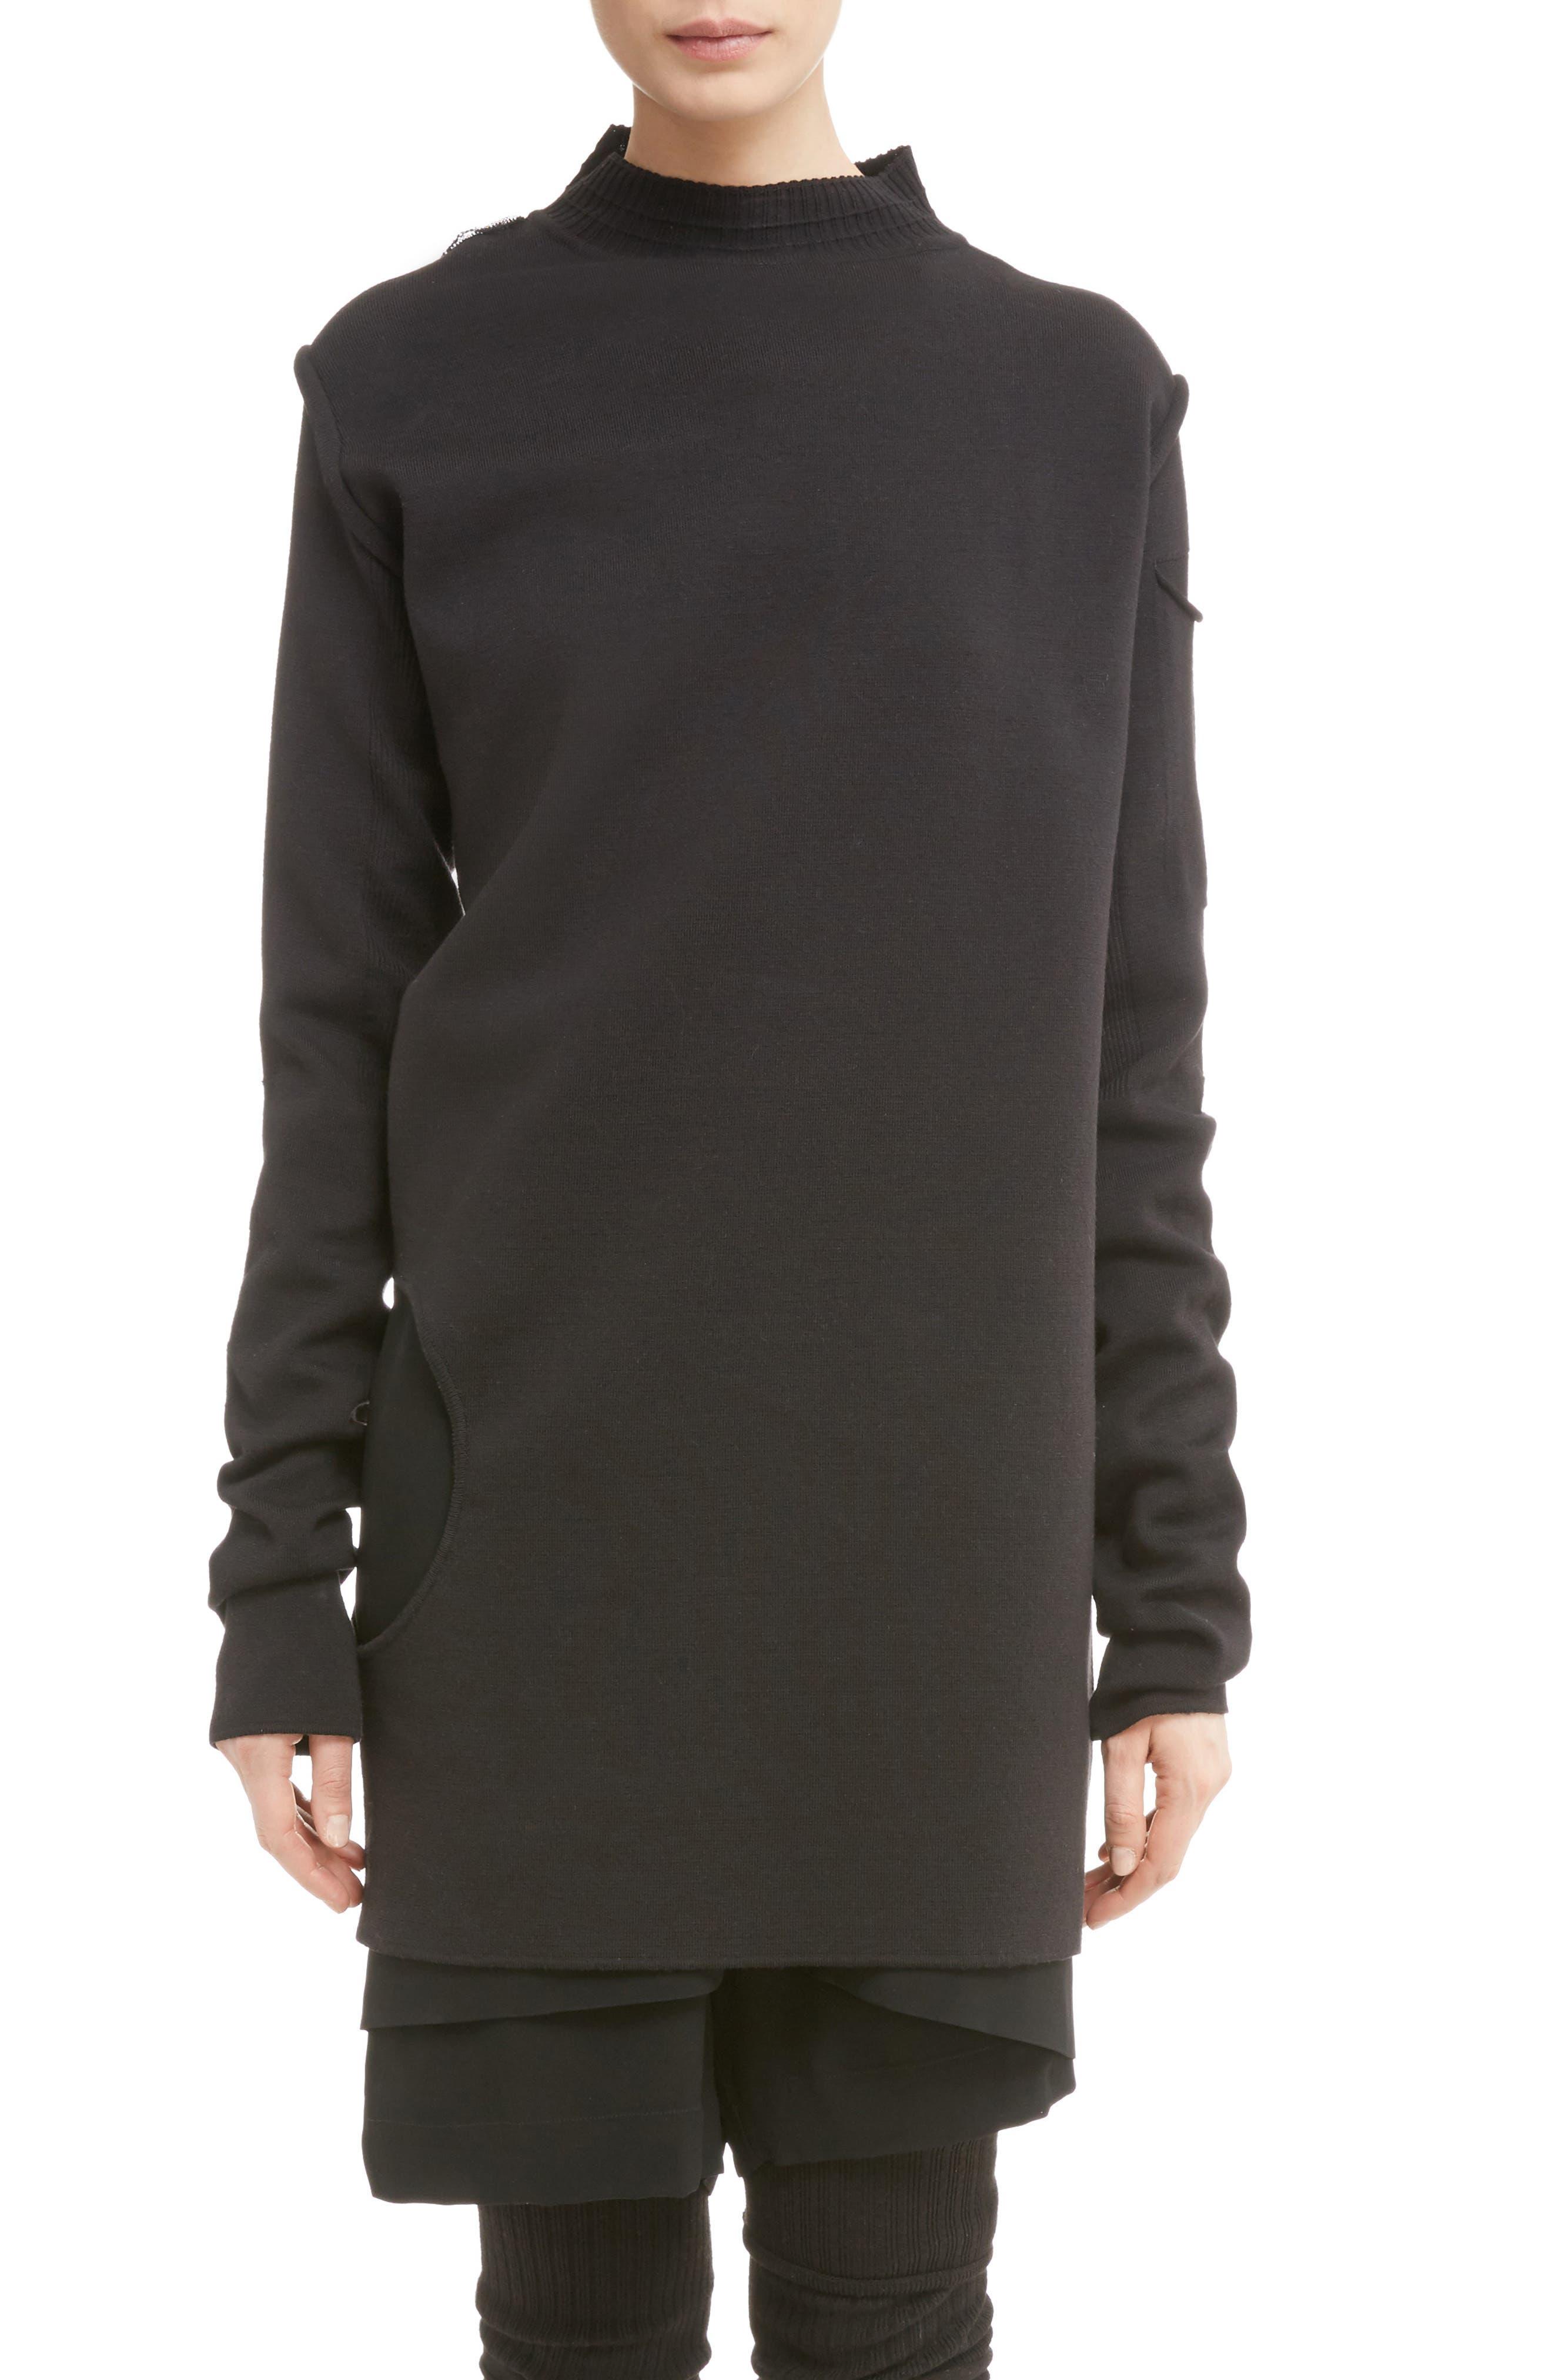 Alternate Image 1 Selected - Rick Owens Subhuman Merino Wool Convertible Sweater